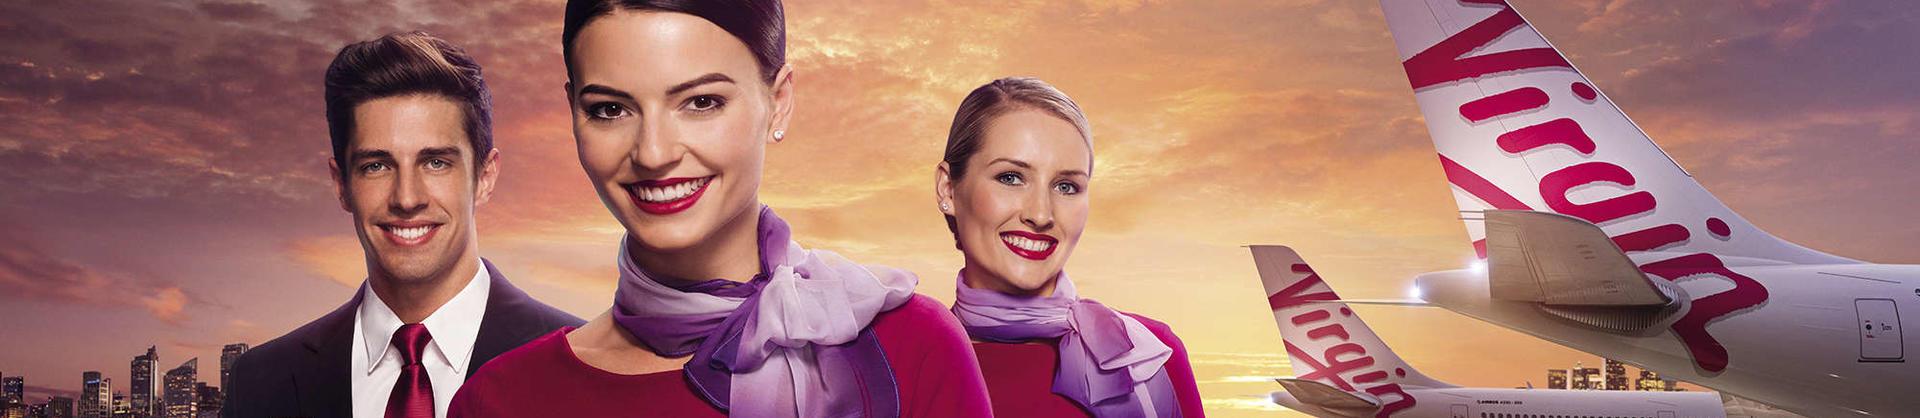 Virgin Australia aircraft and crew